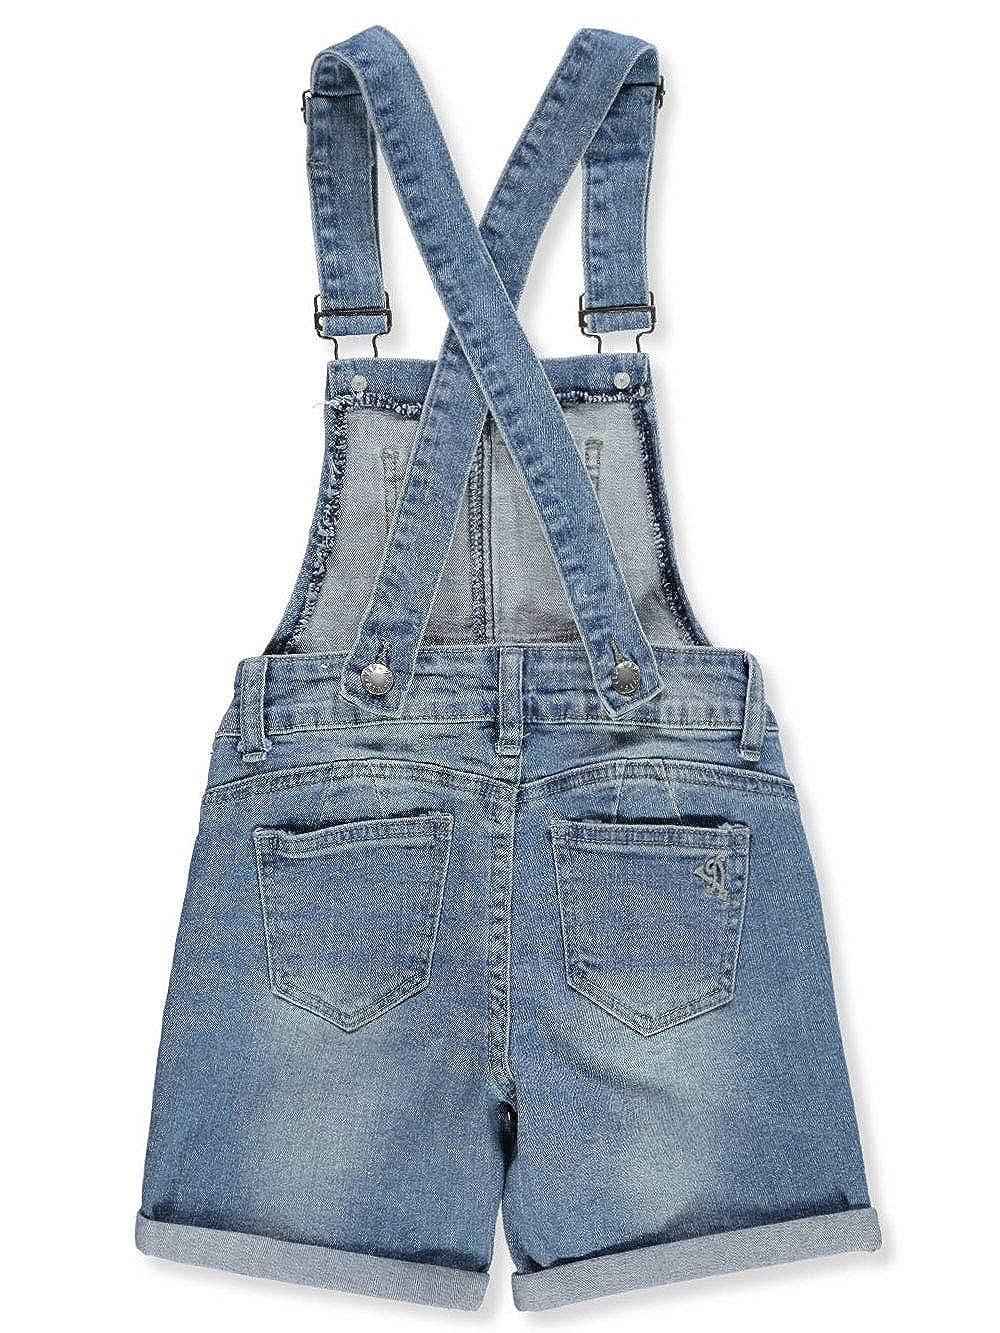 #VIP Jeans Girls Denim Shortalls